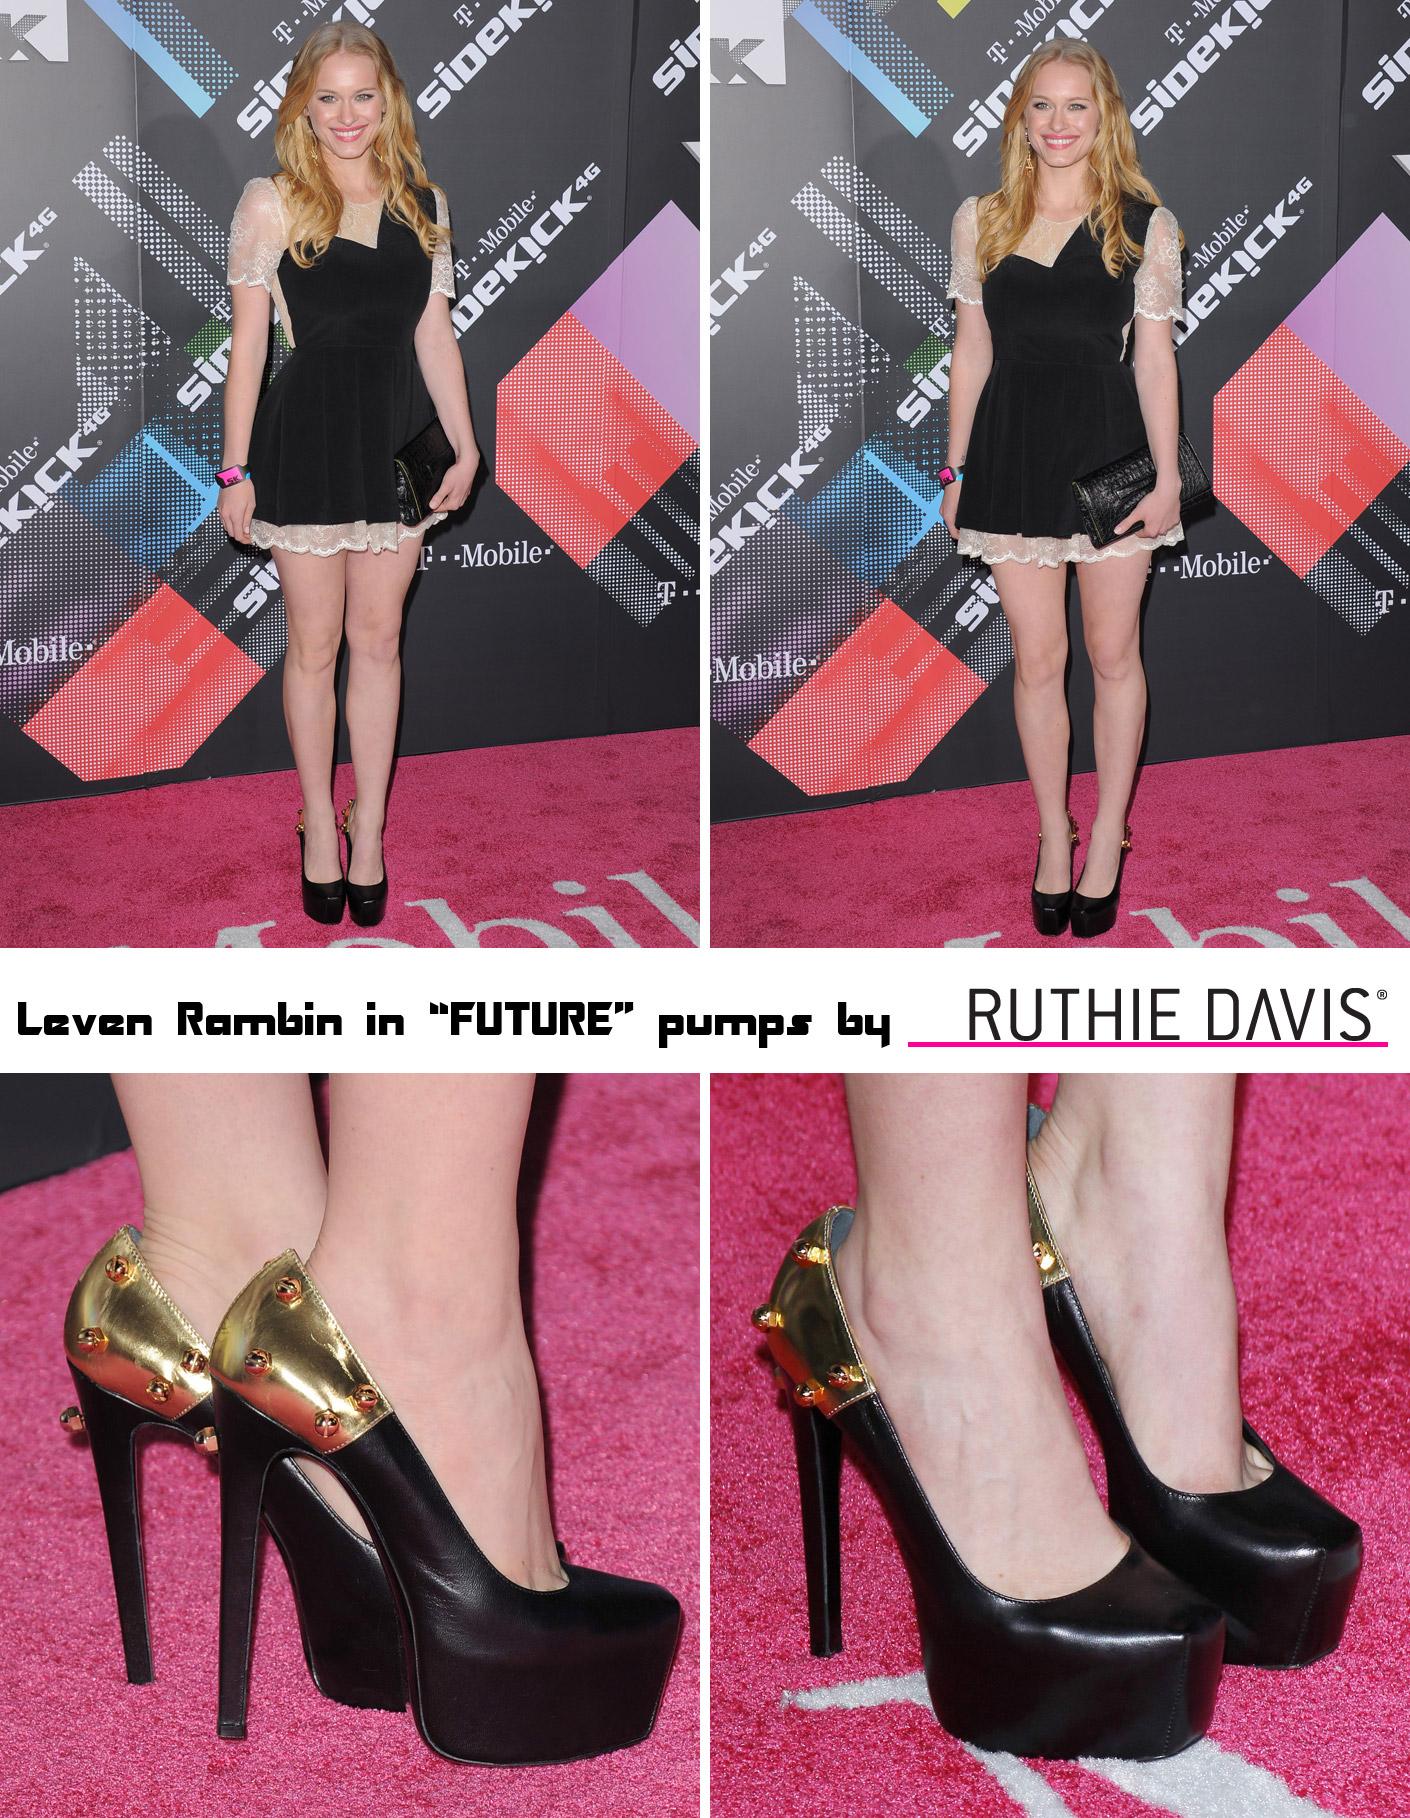 Silver 6 Inch High Heels